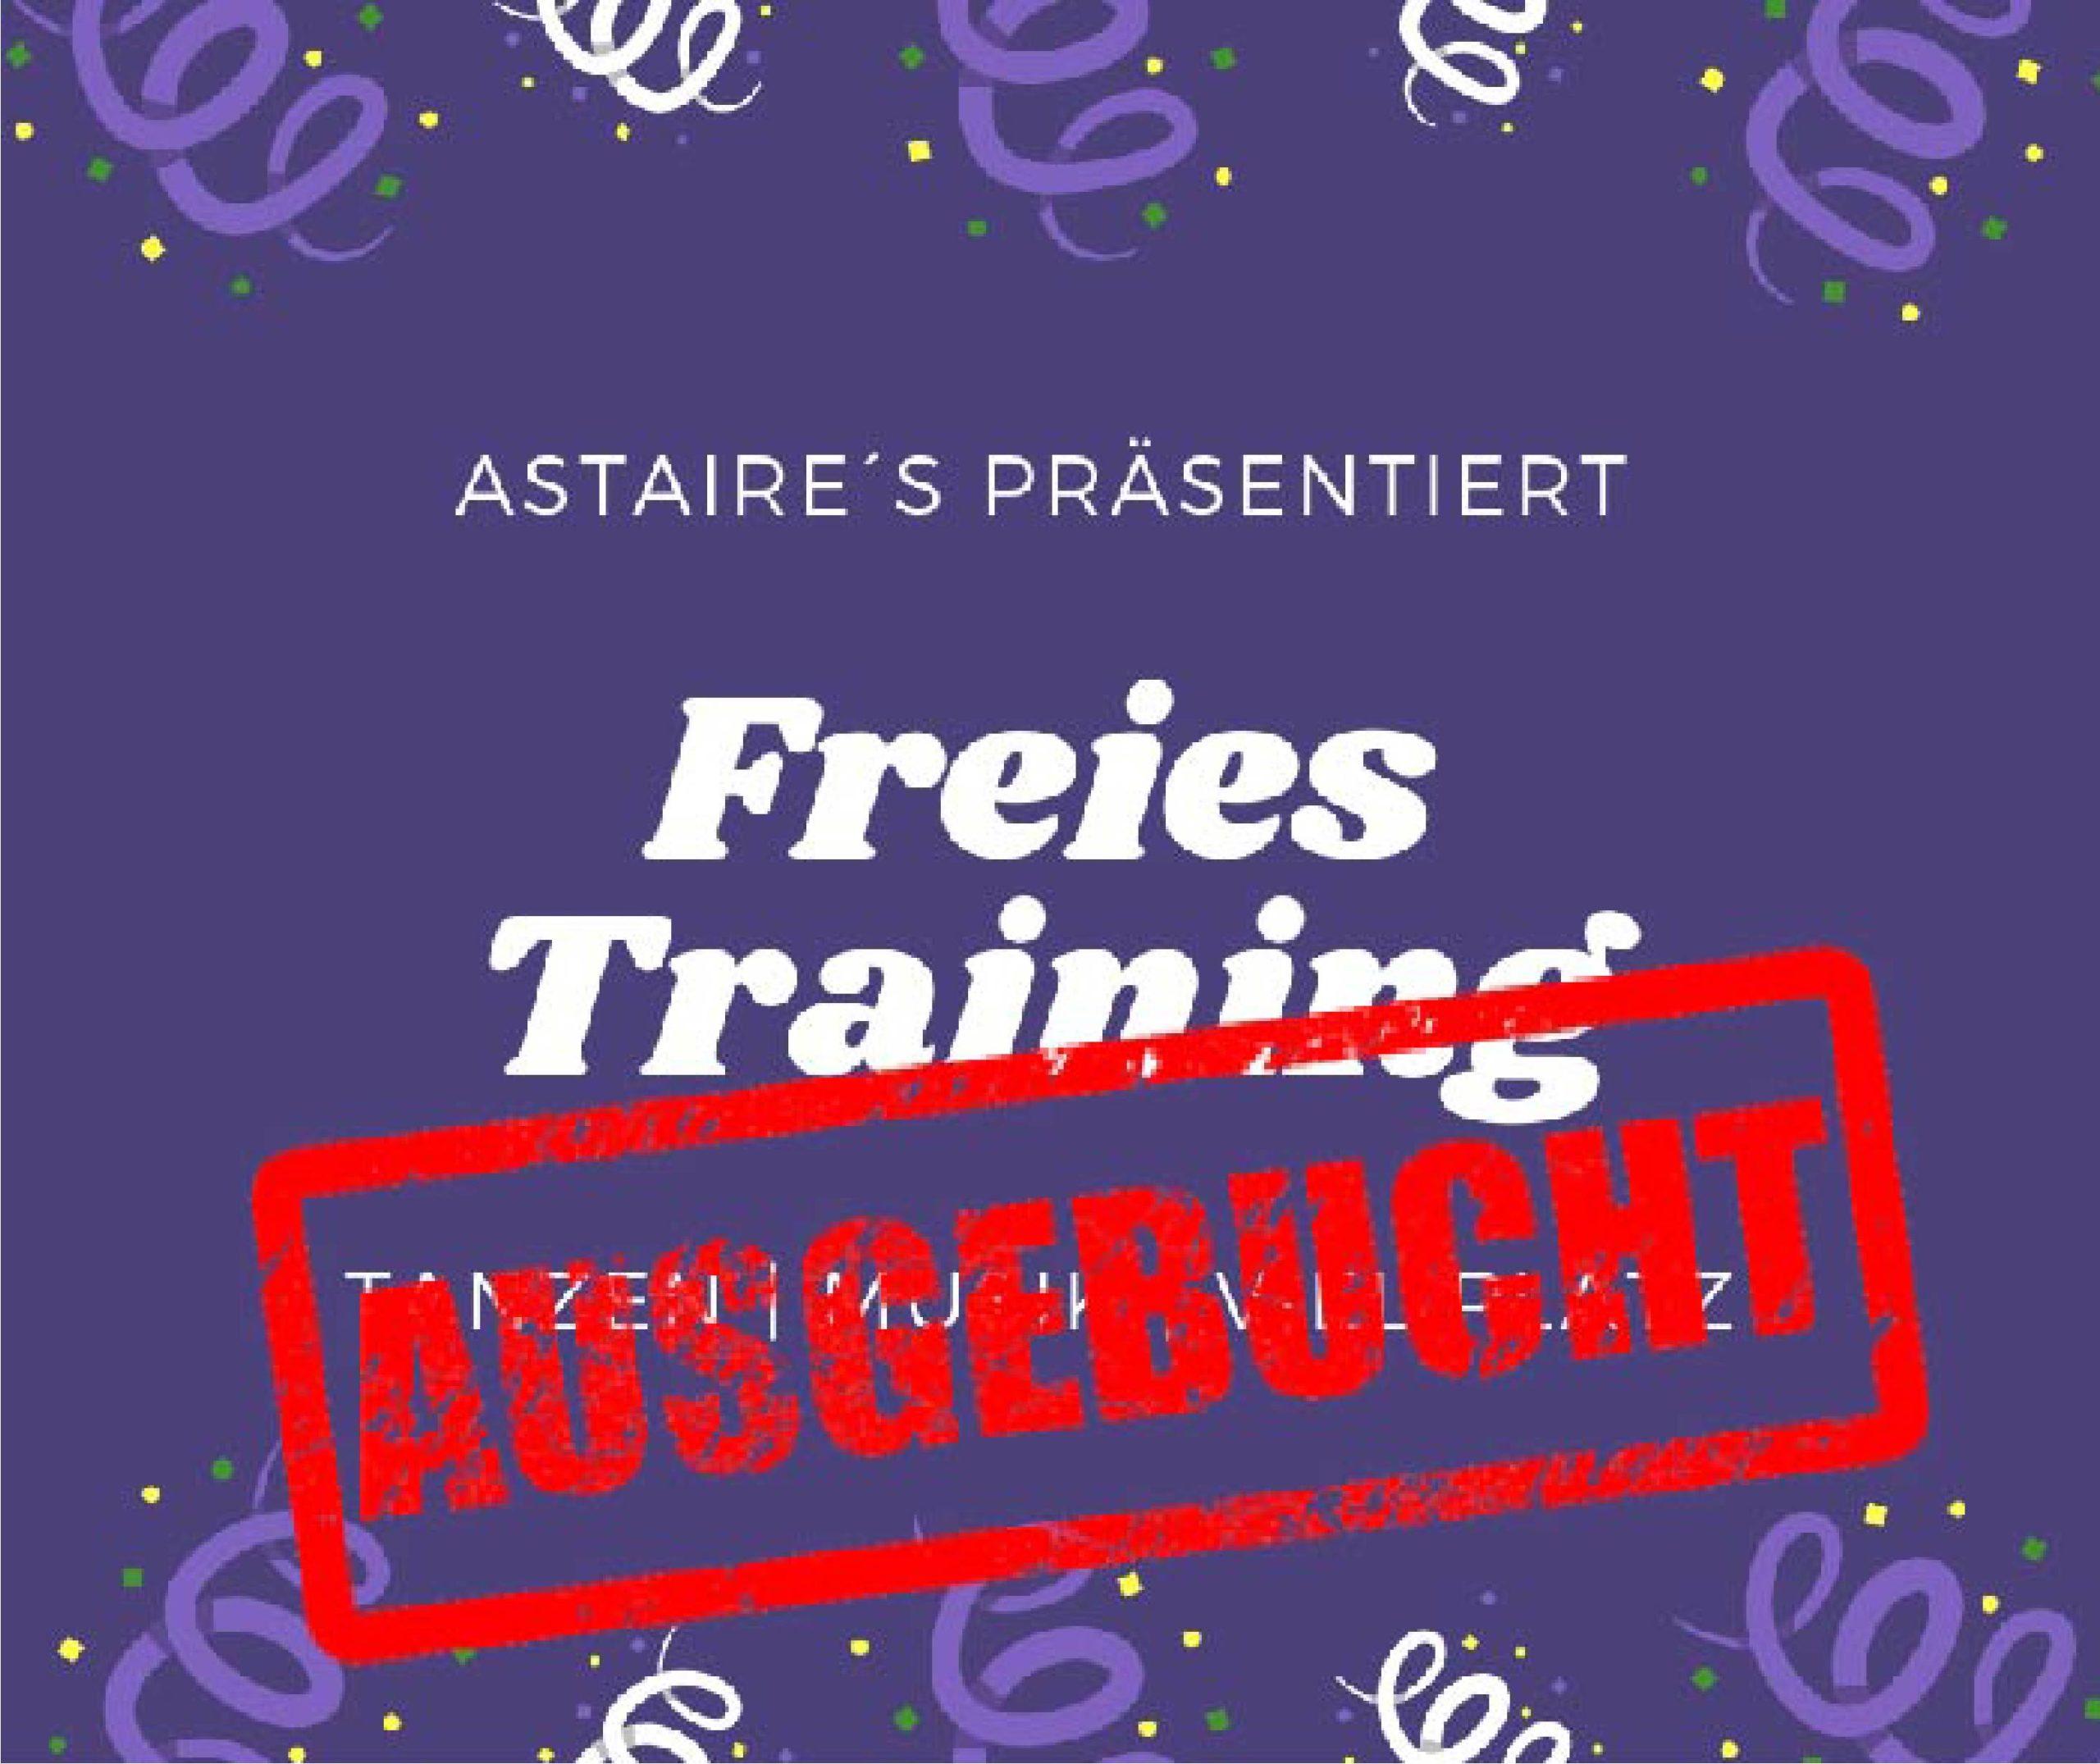 Freies Training Di, 11.05.2021